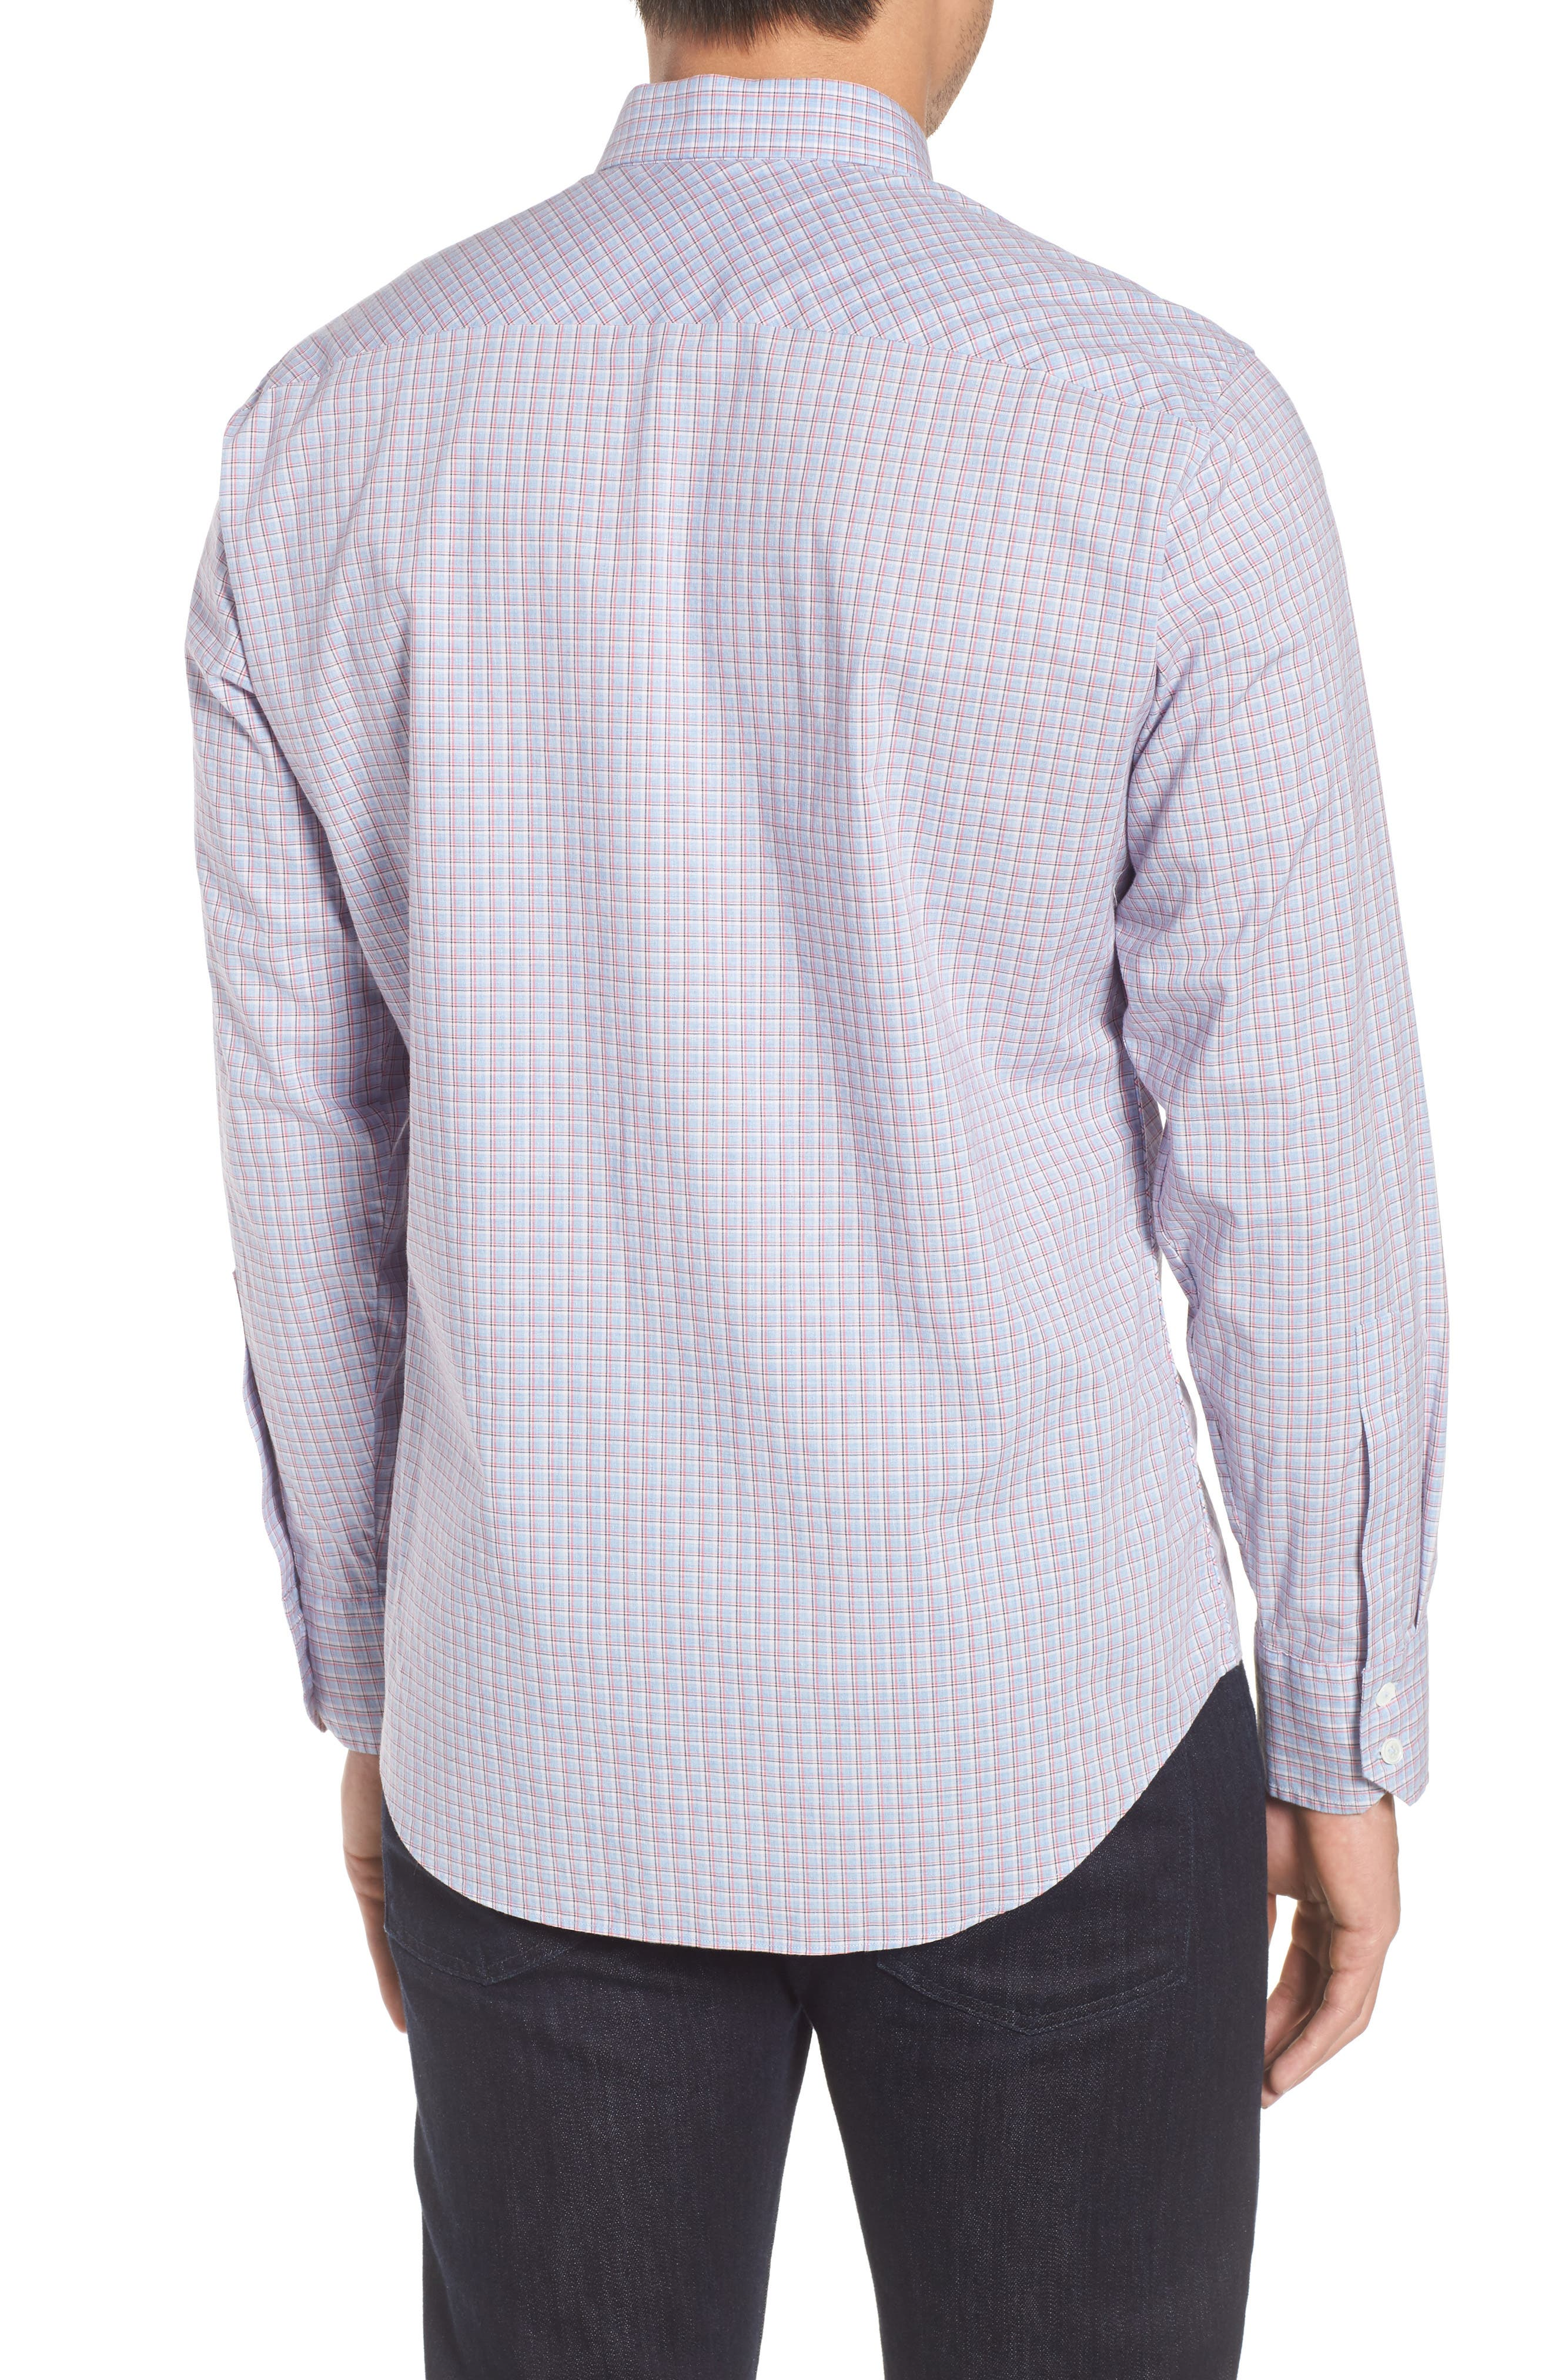 ZACHARY PRELL, Drozdov Regular Fit Plaid Sport Shirt, Alternate thumbnail 2, color, PINK